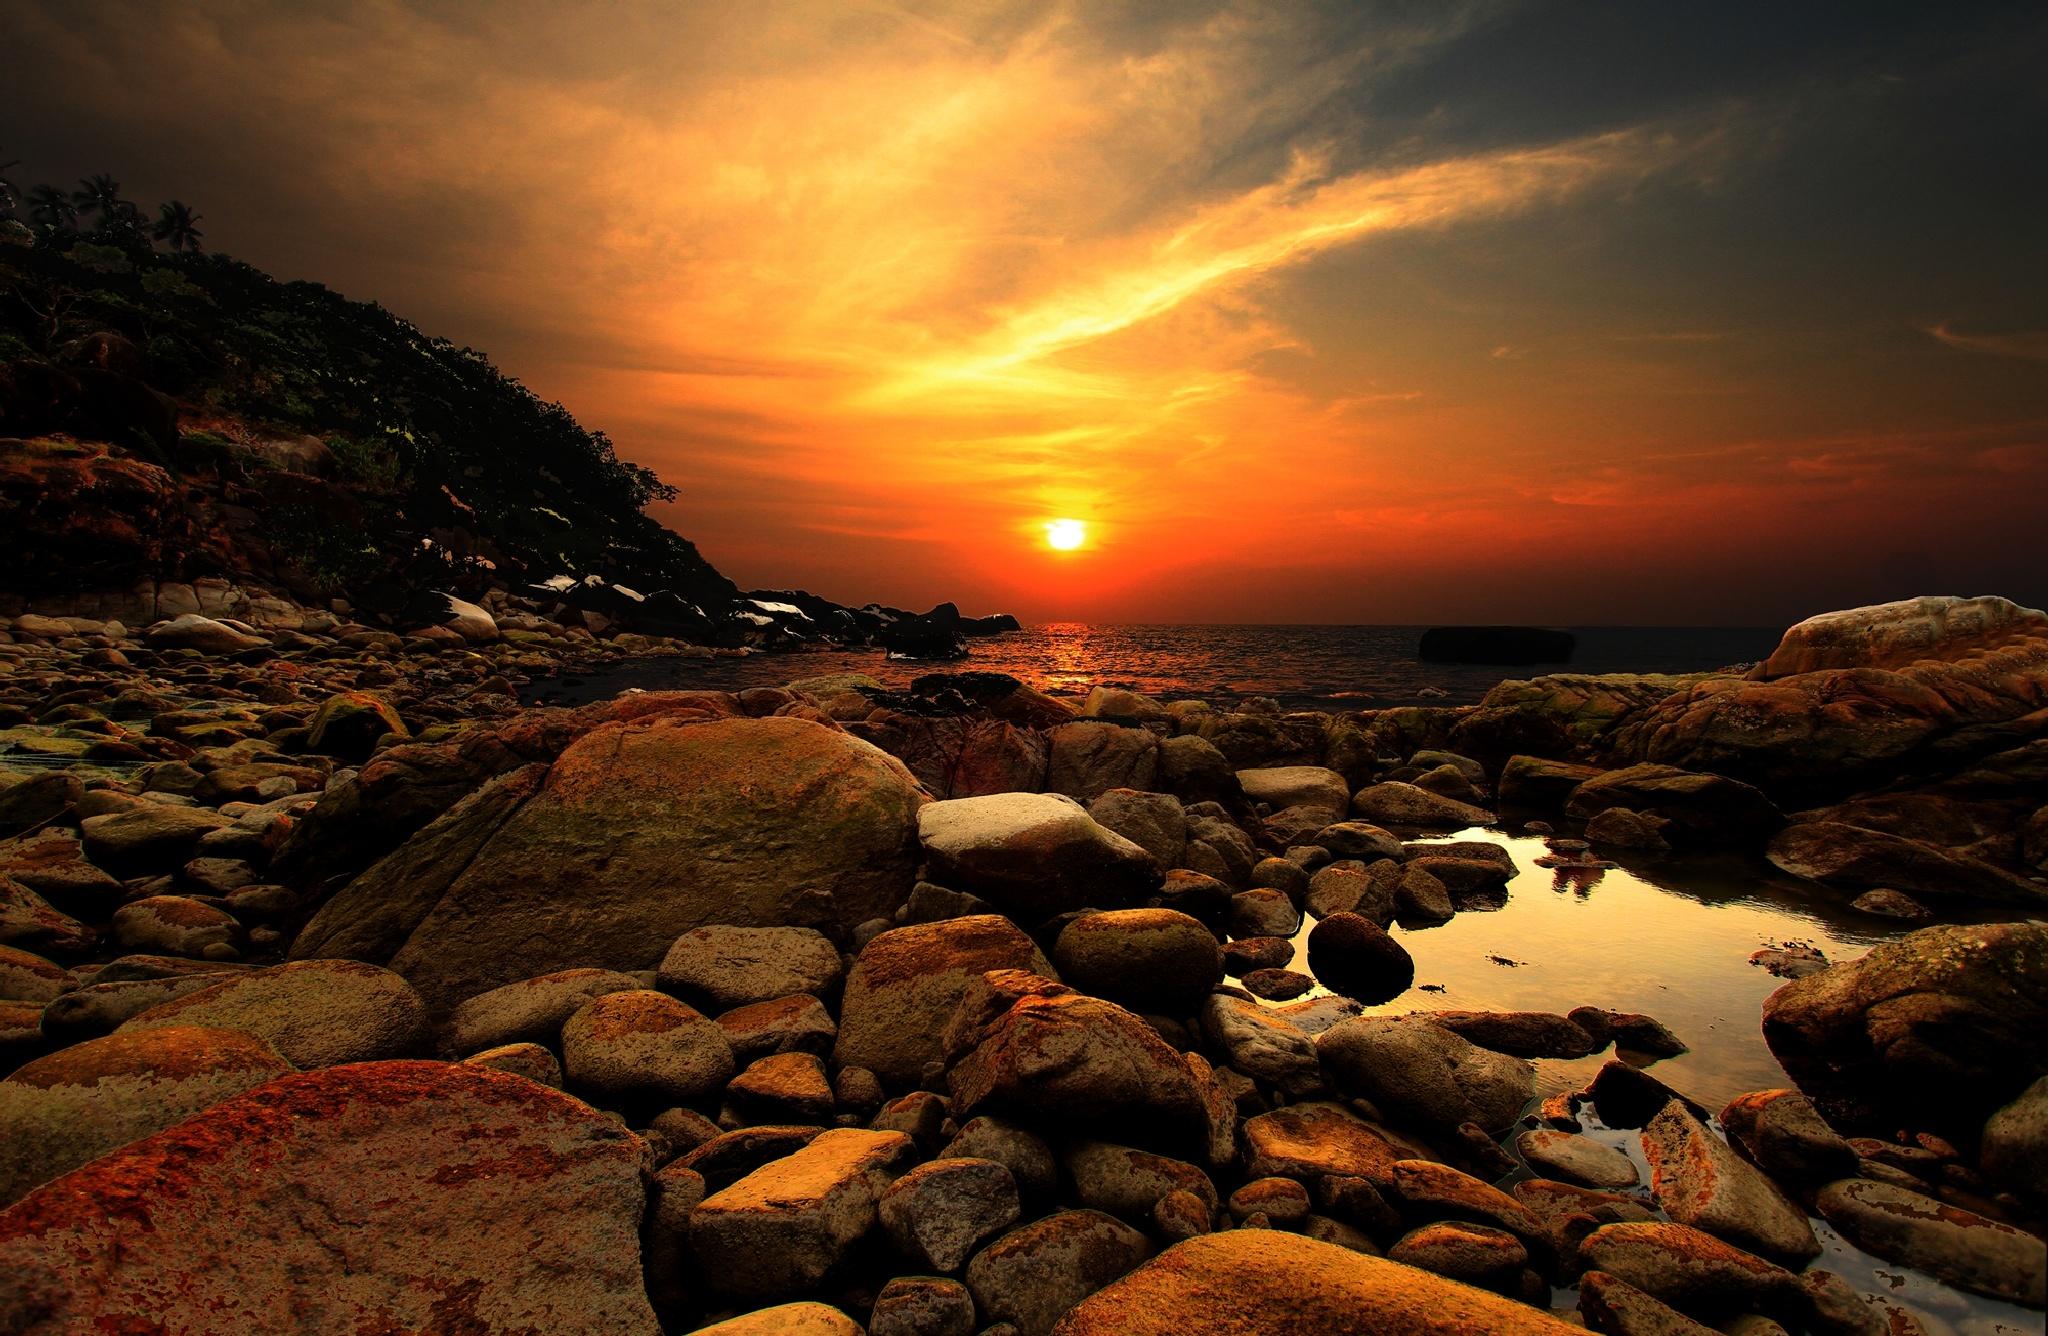 Amazing Sunset over Goa beaches by Dhruv Ashra